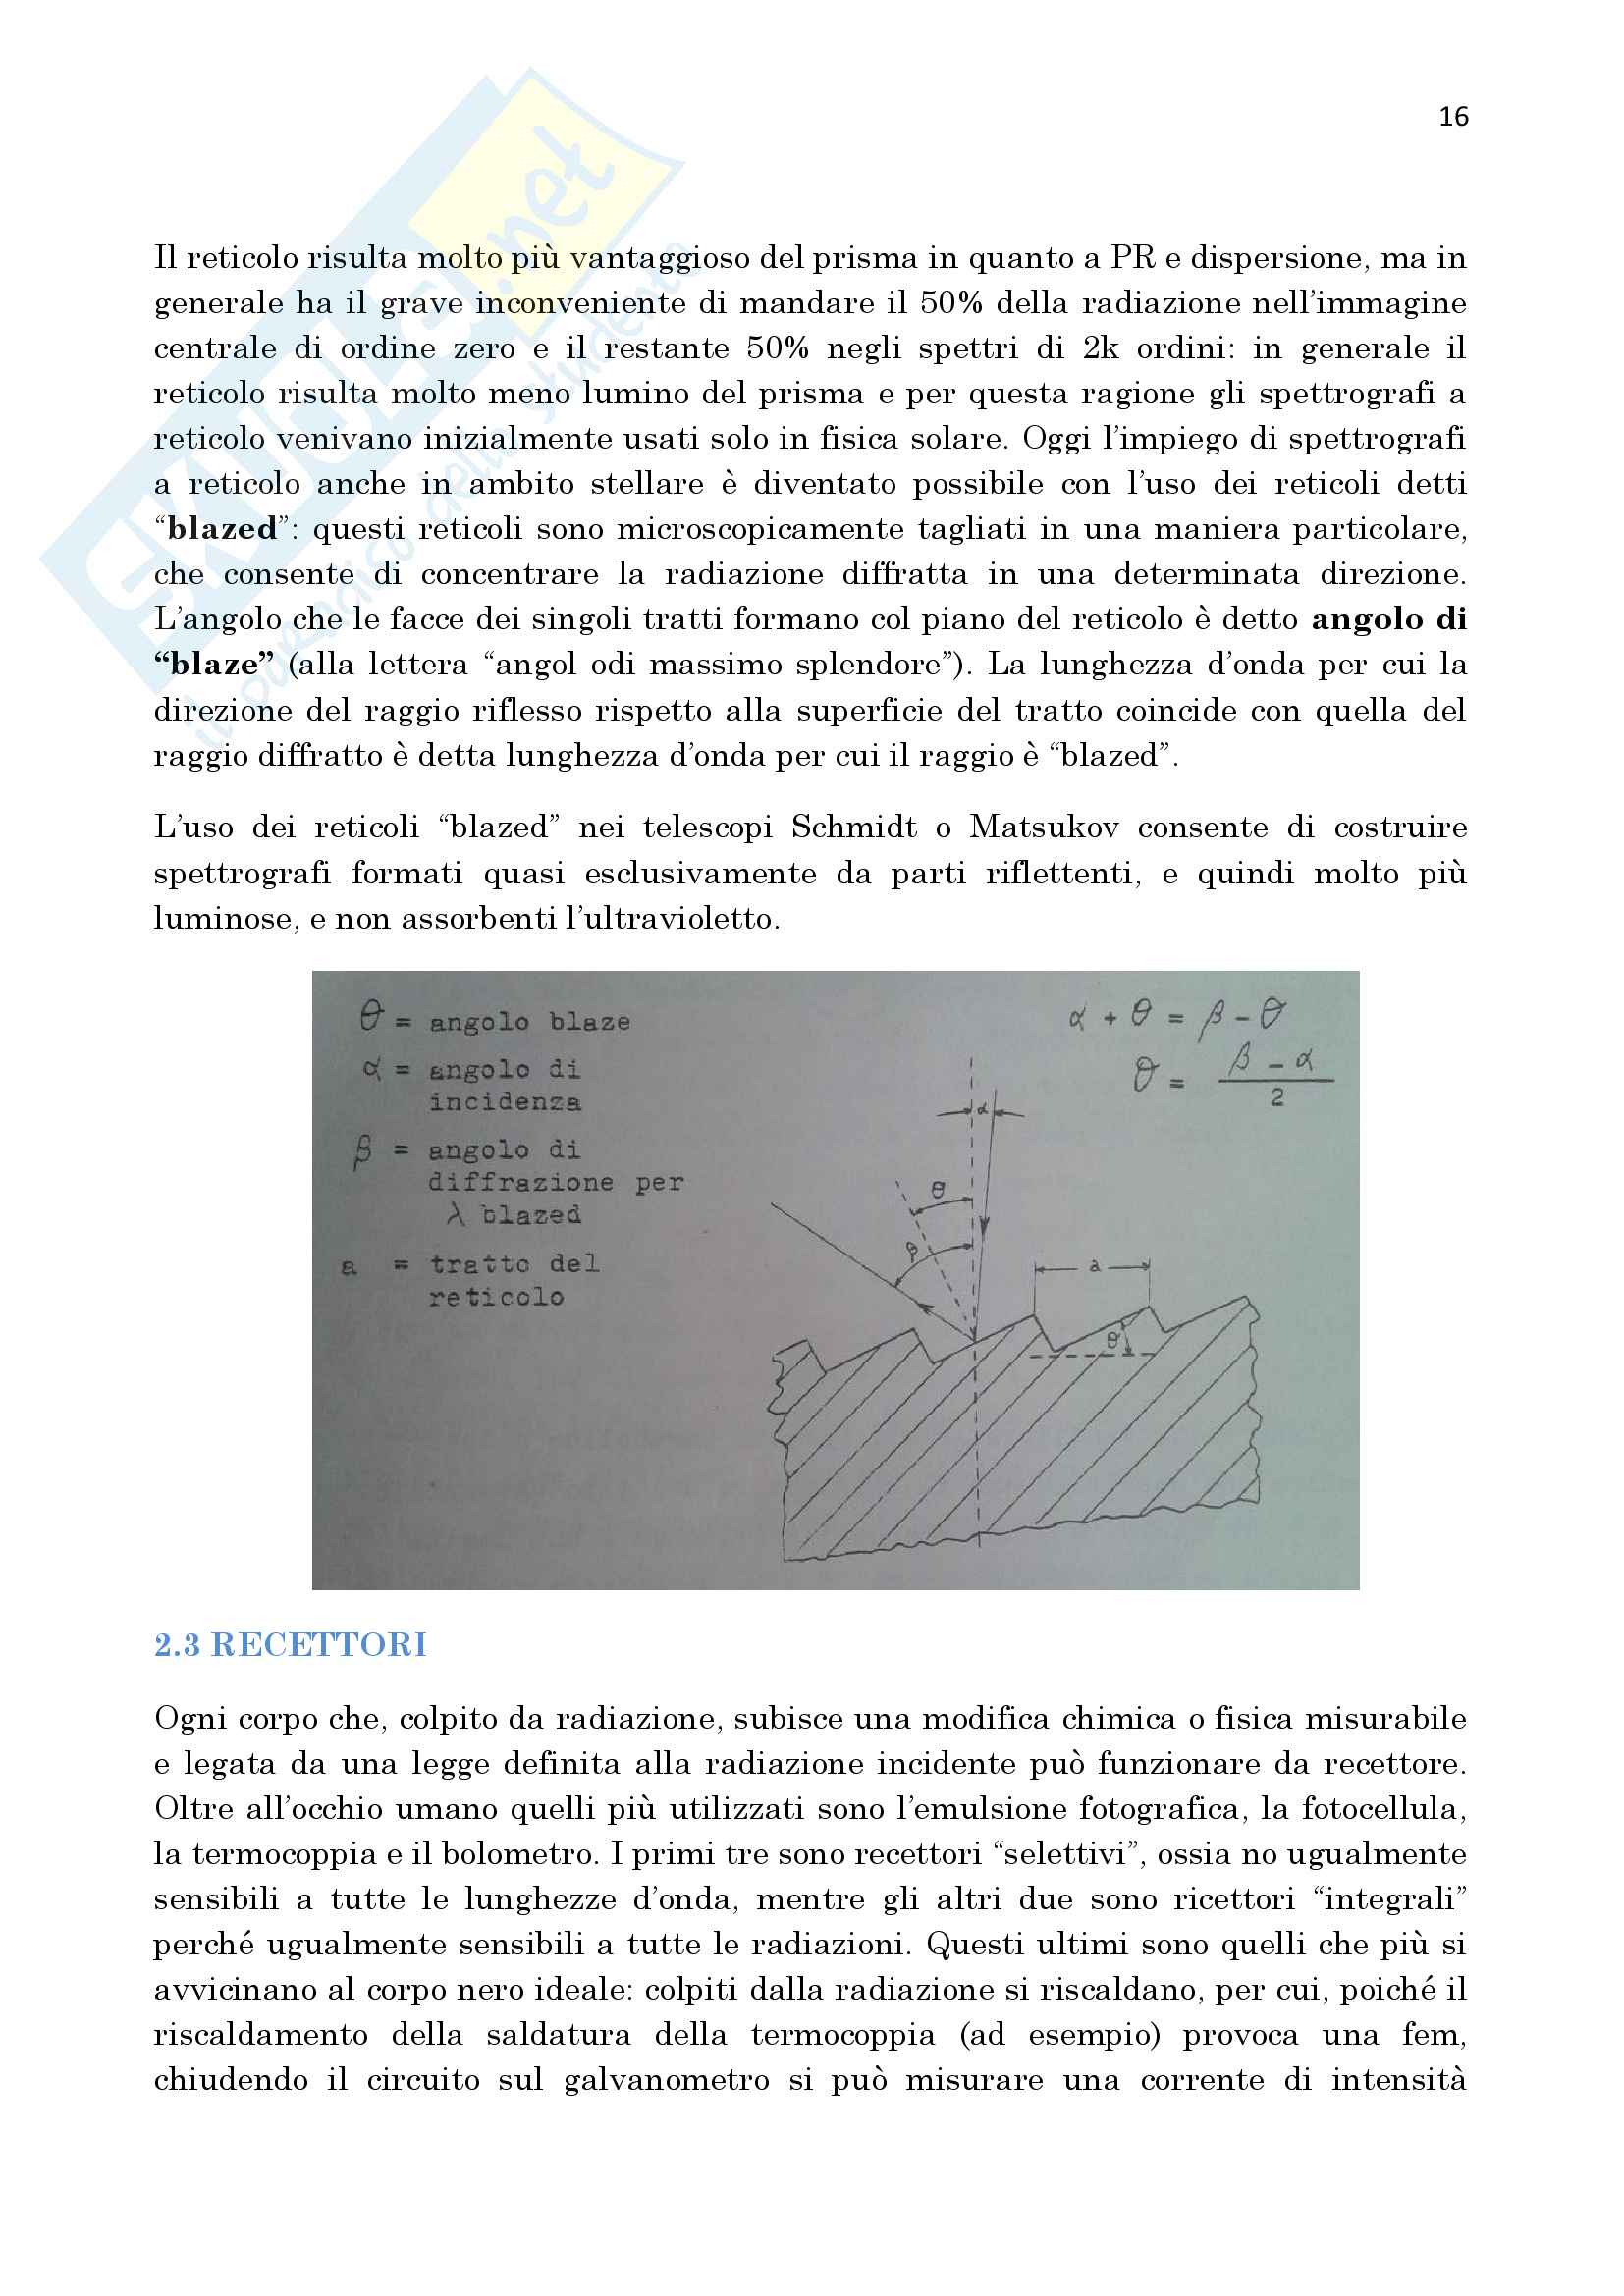 Astronomia Pag. 16